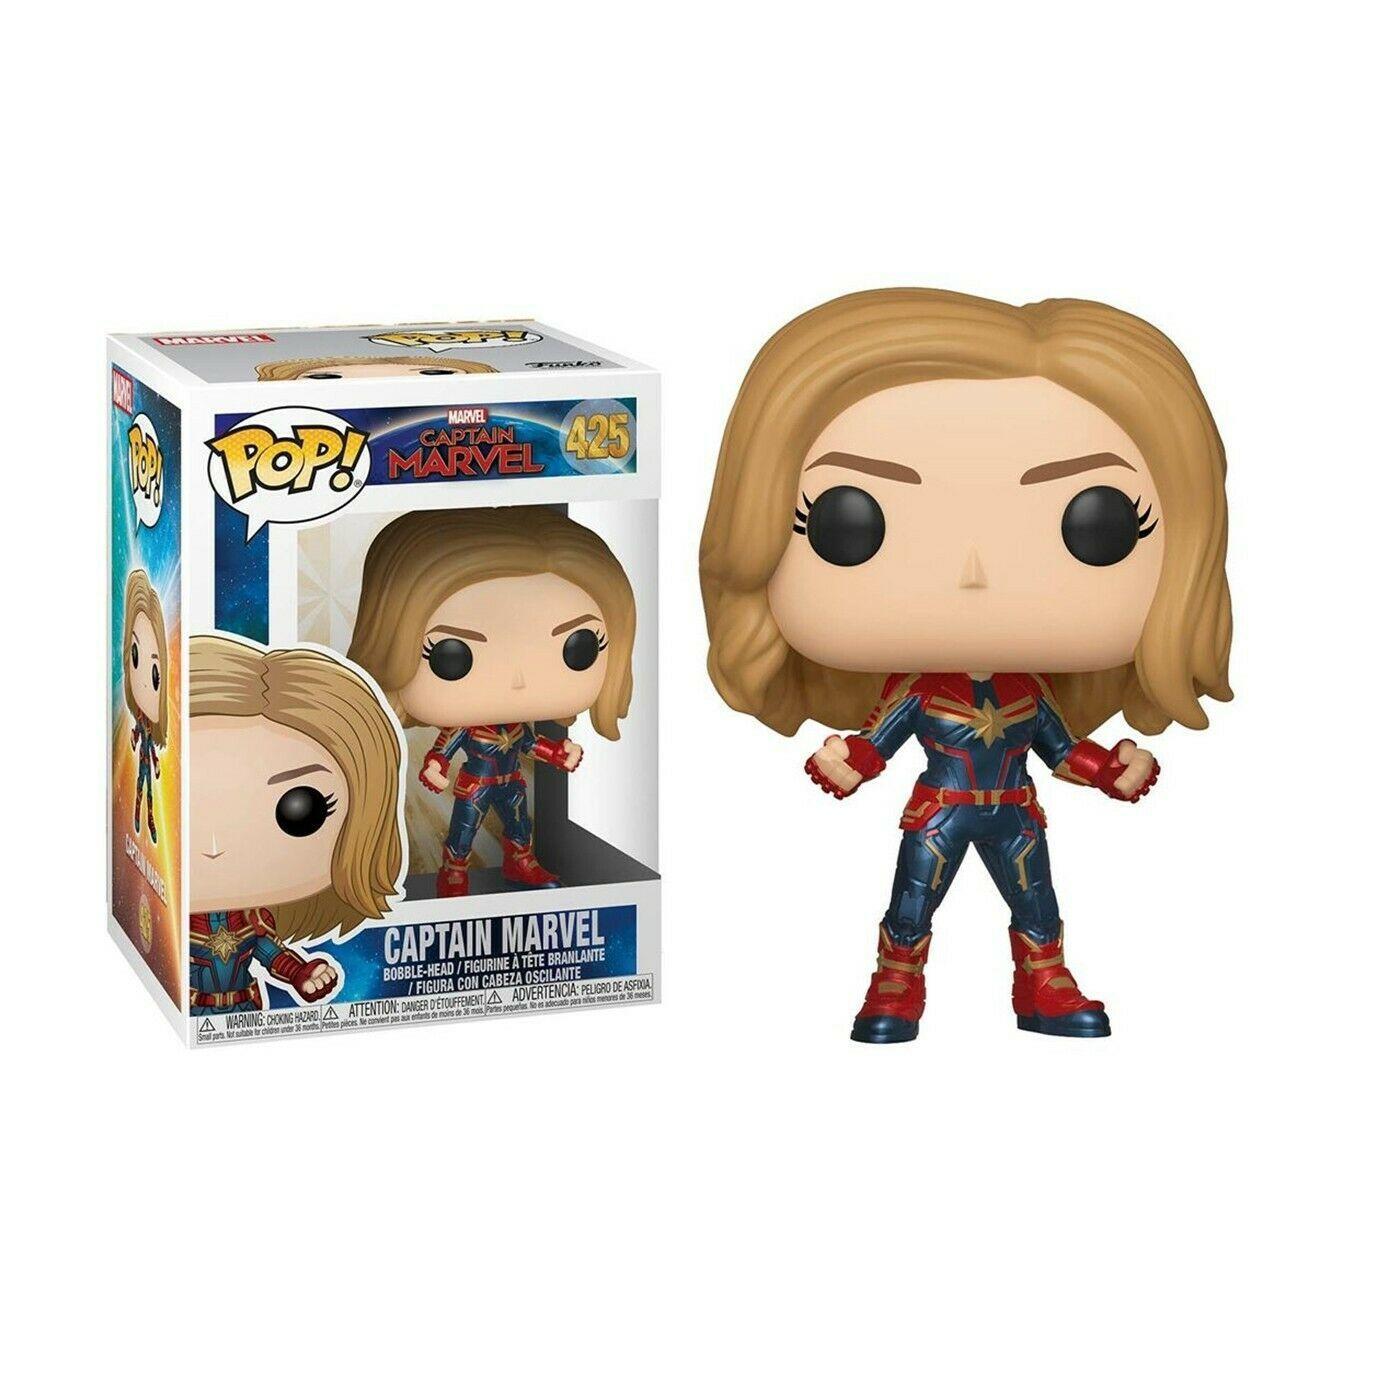 Pop! Marvel: Captain Marvel - Captain Marvel  - $21.98